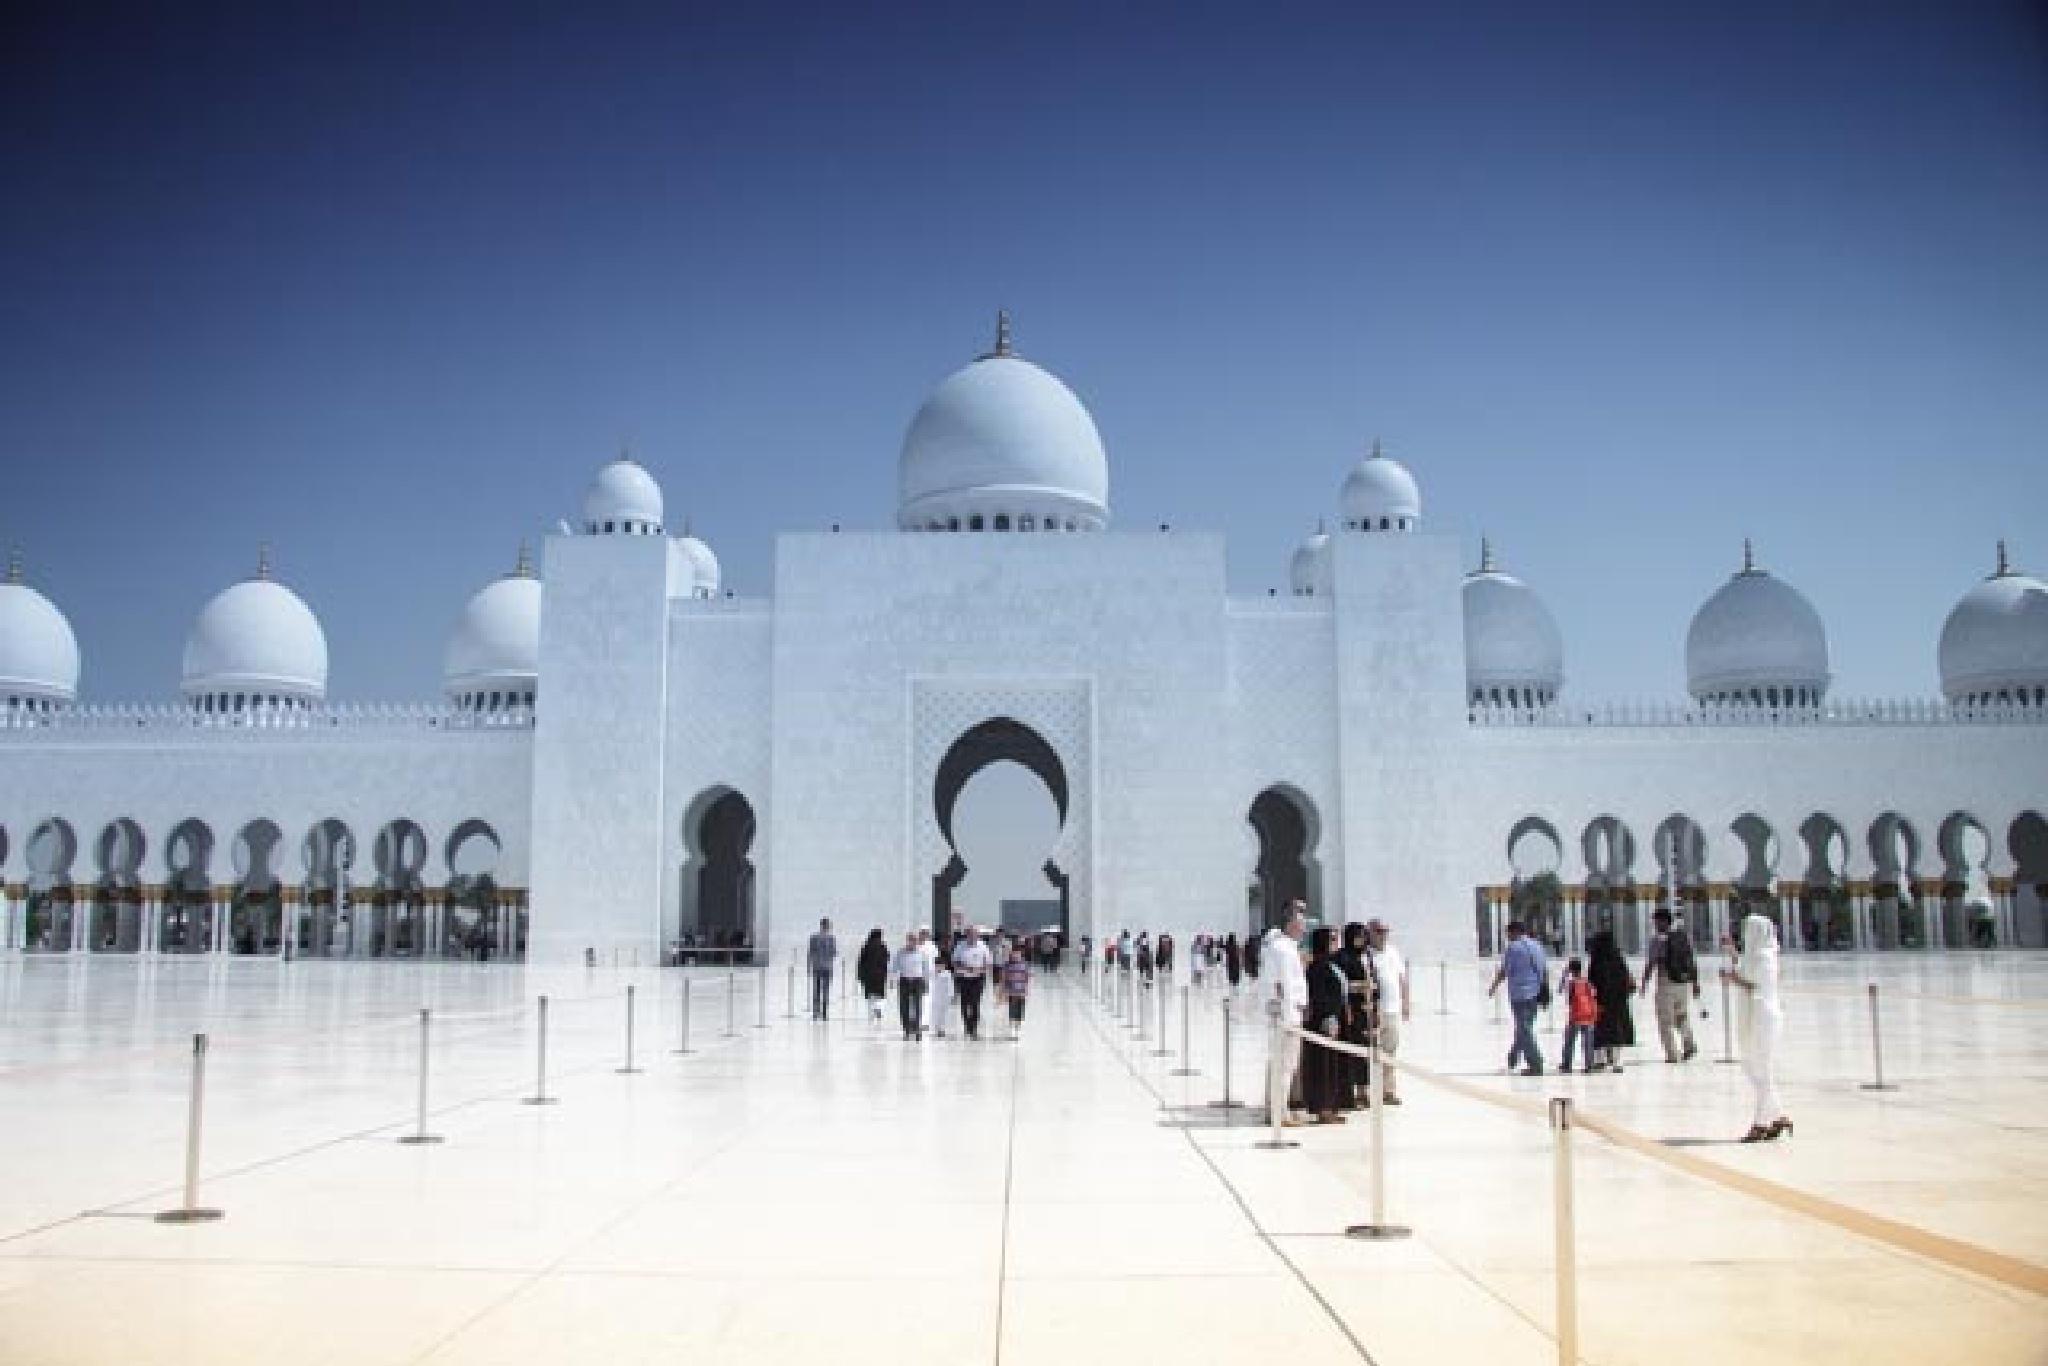 Abu Dhabi by charles1962